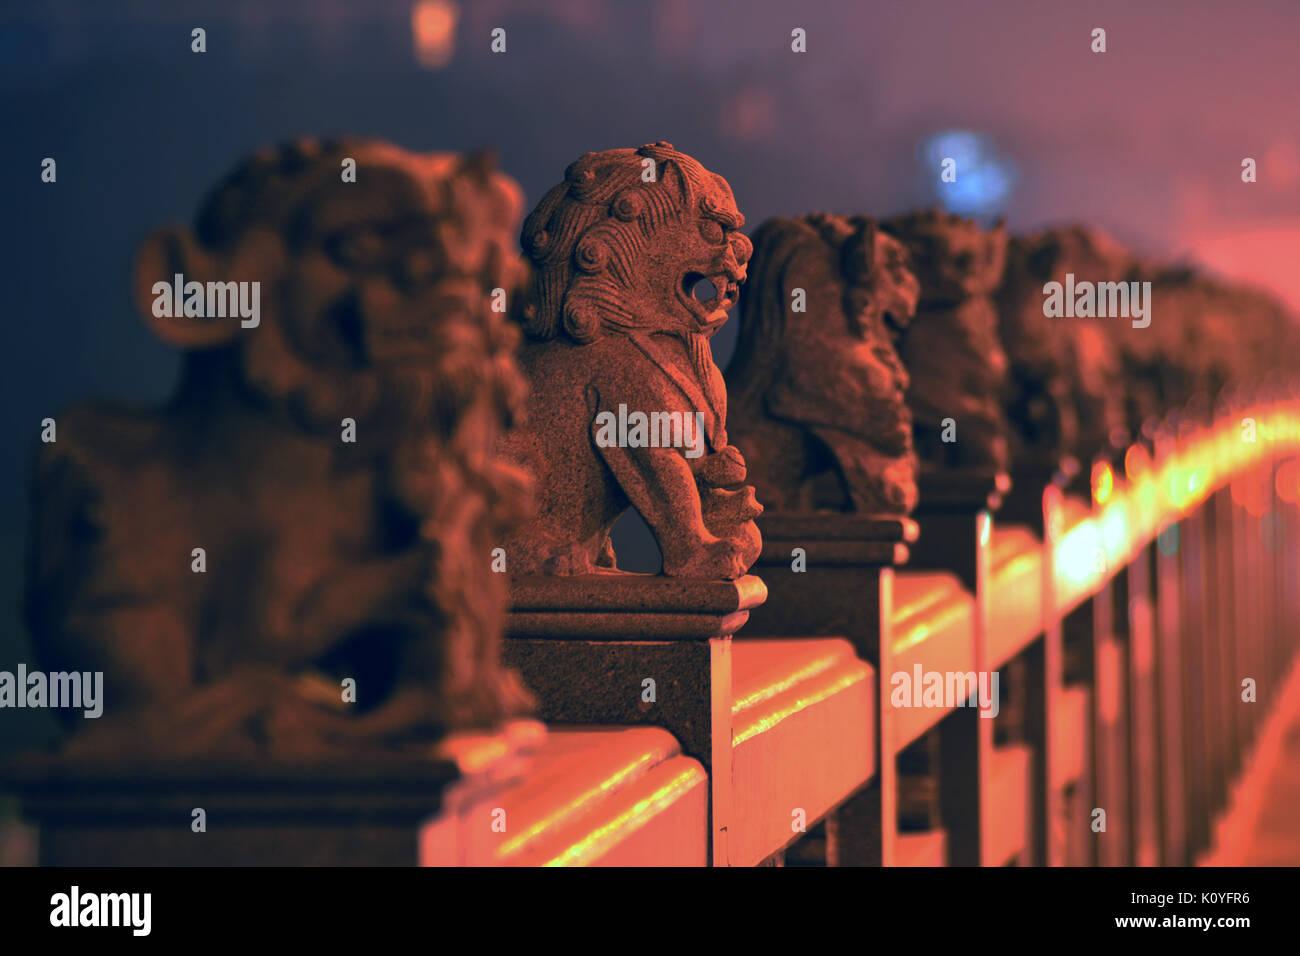 Evening Foo Dogs - Stock Image